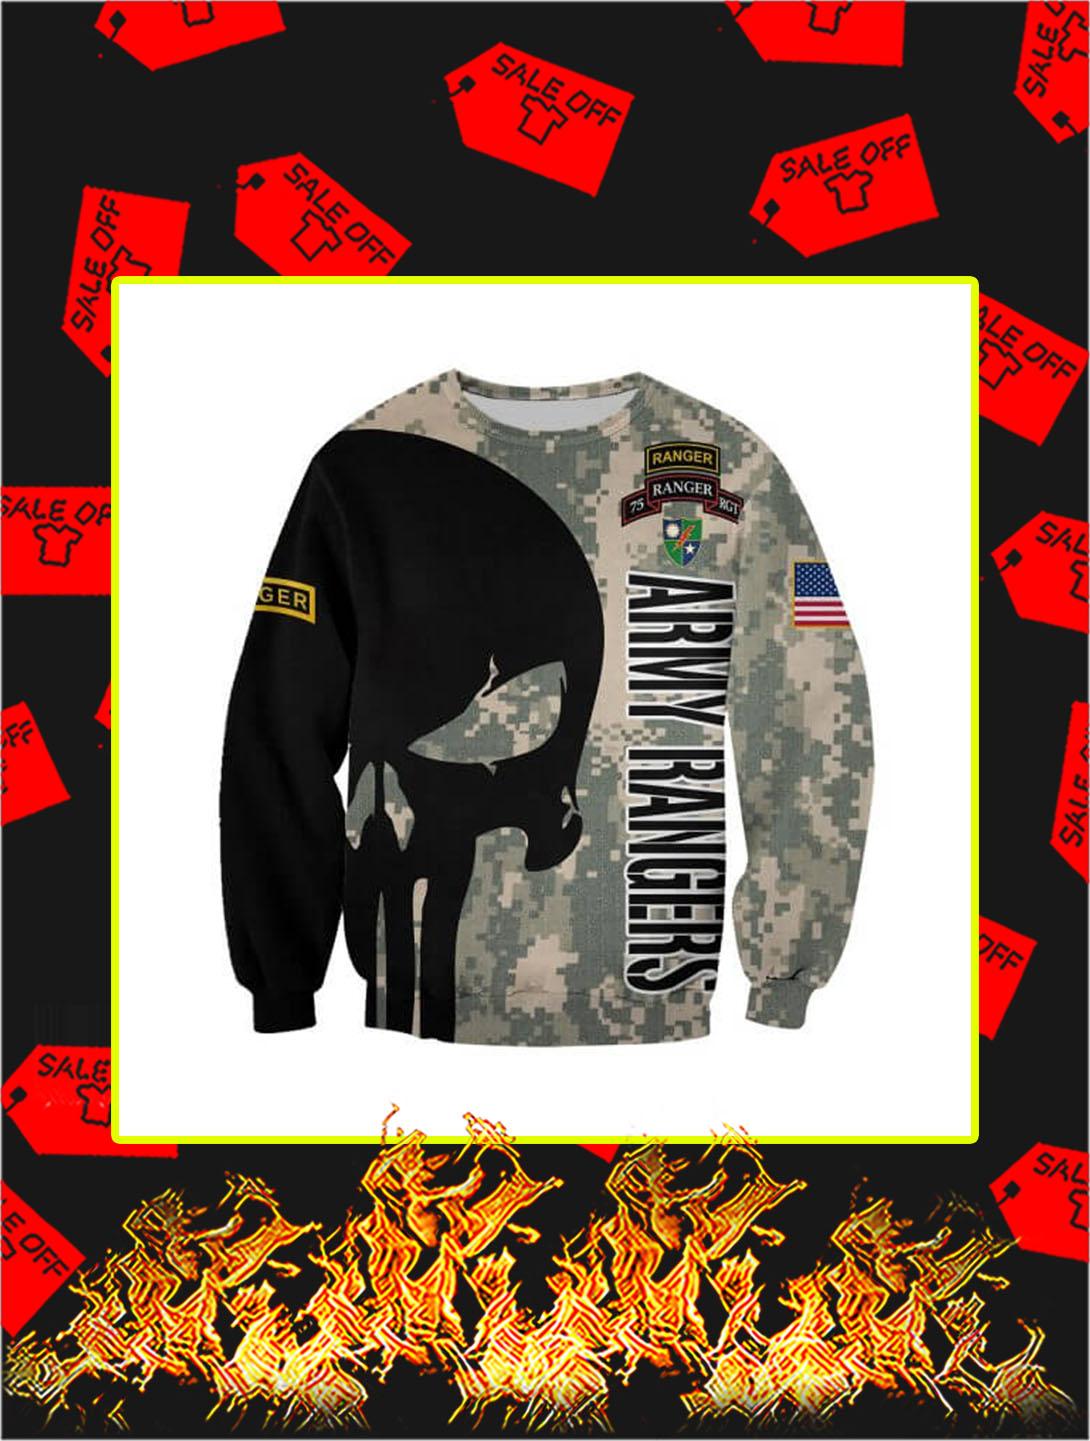 3D Printed US Army Rangers Punisher Skull Sweatshirt